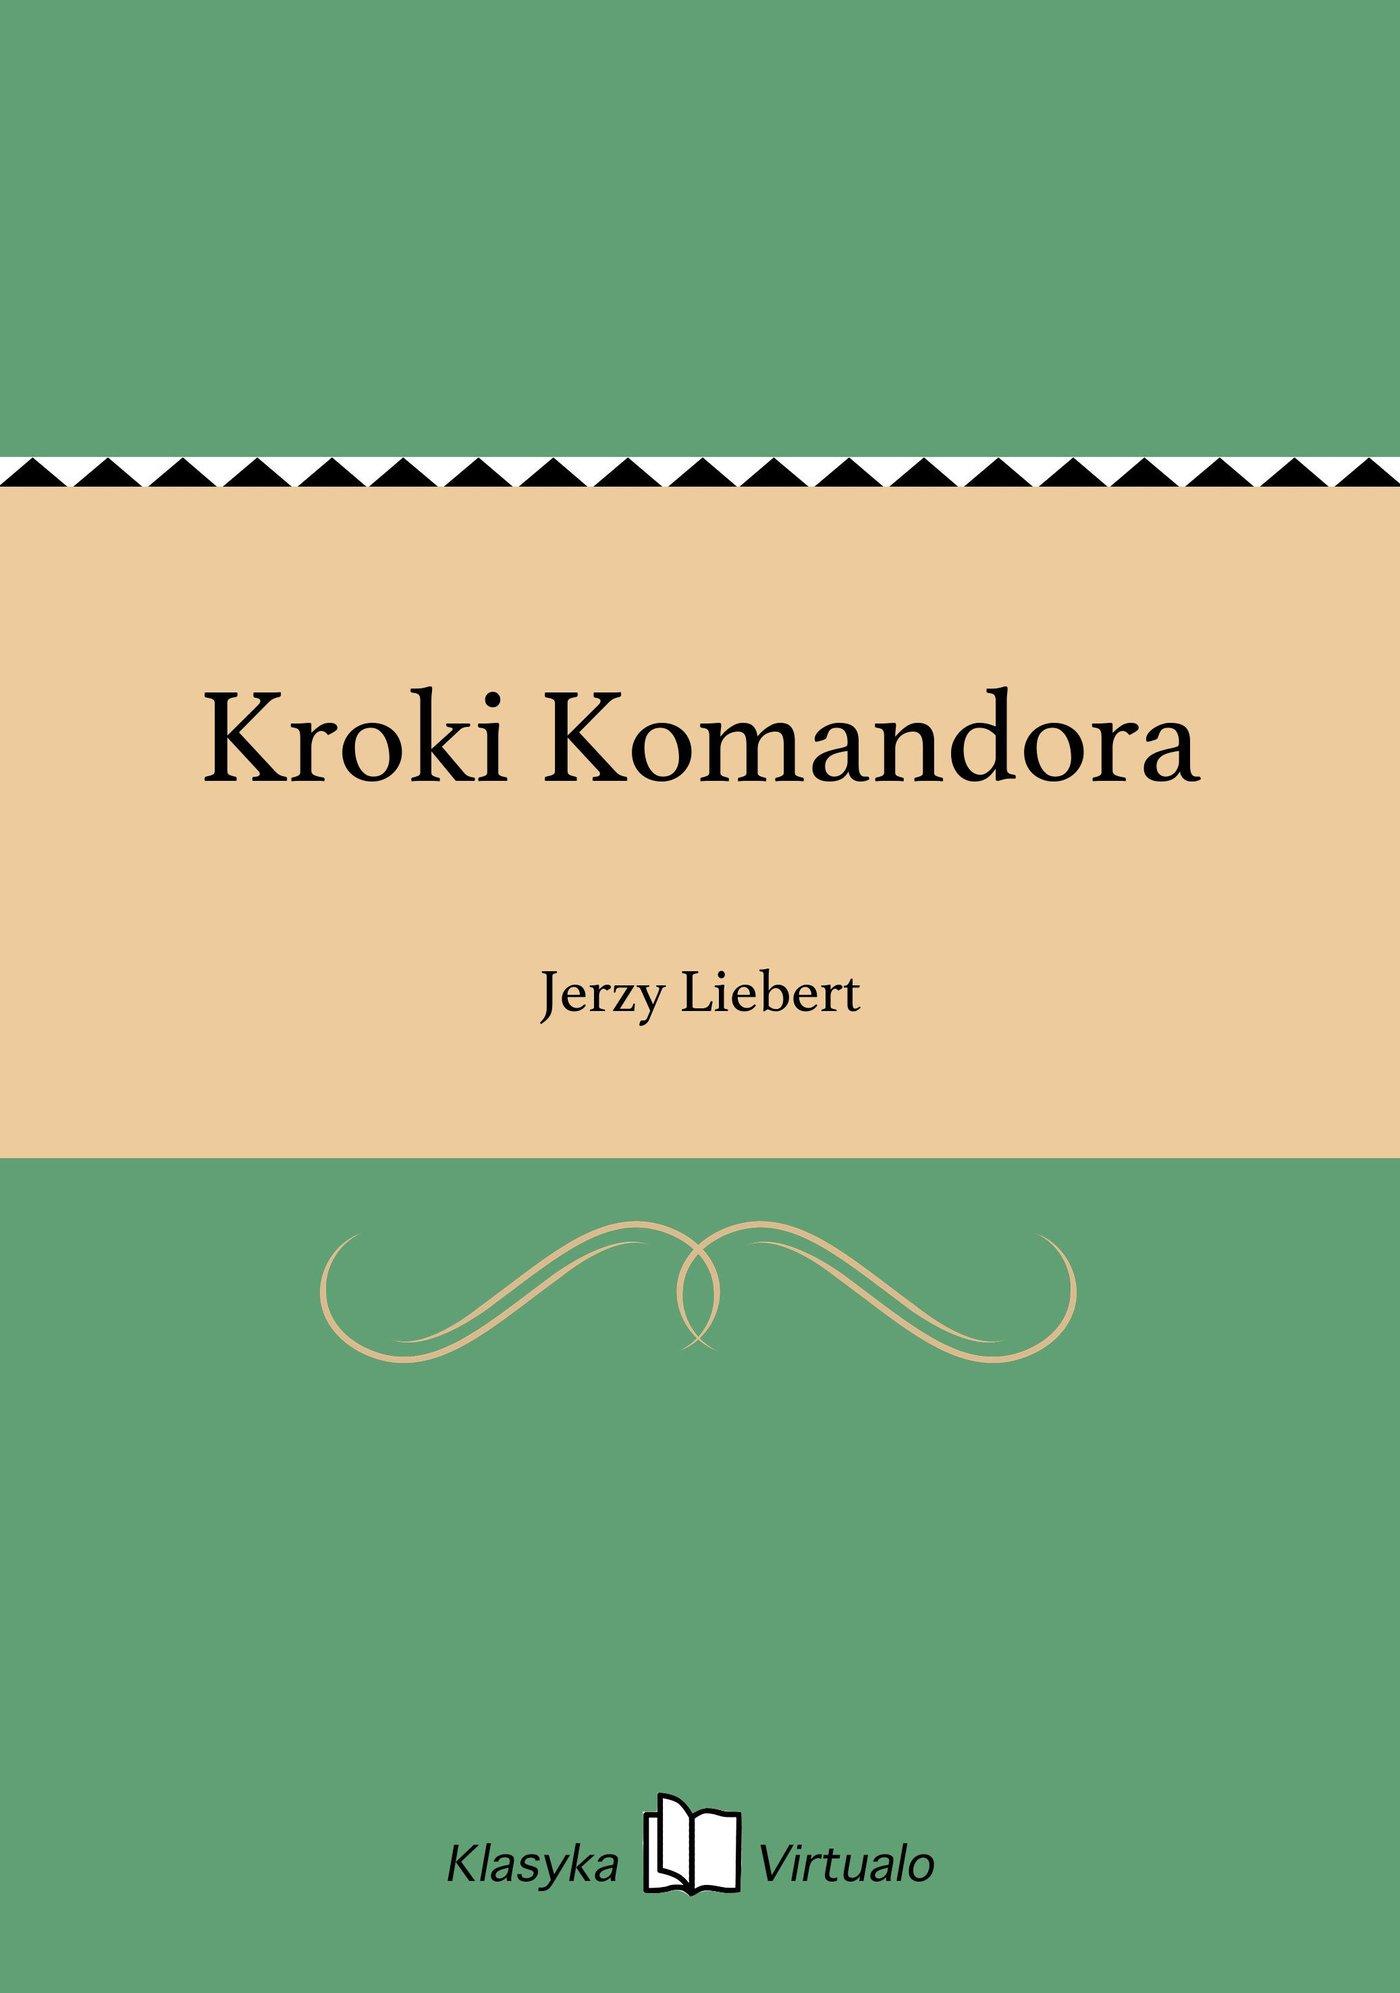 Kroki Komandora - Ebook (Książka EPUB) do pobrania w formacie EPUB